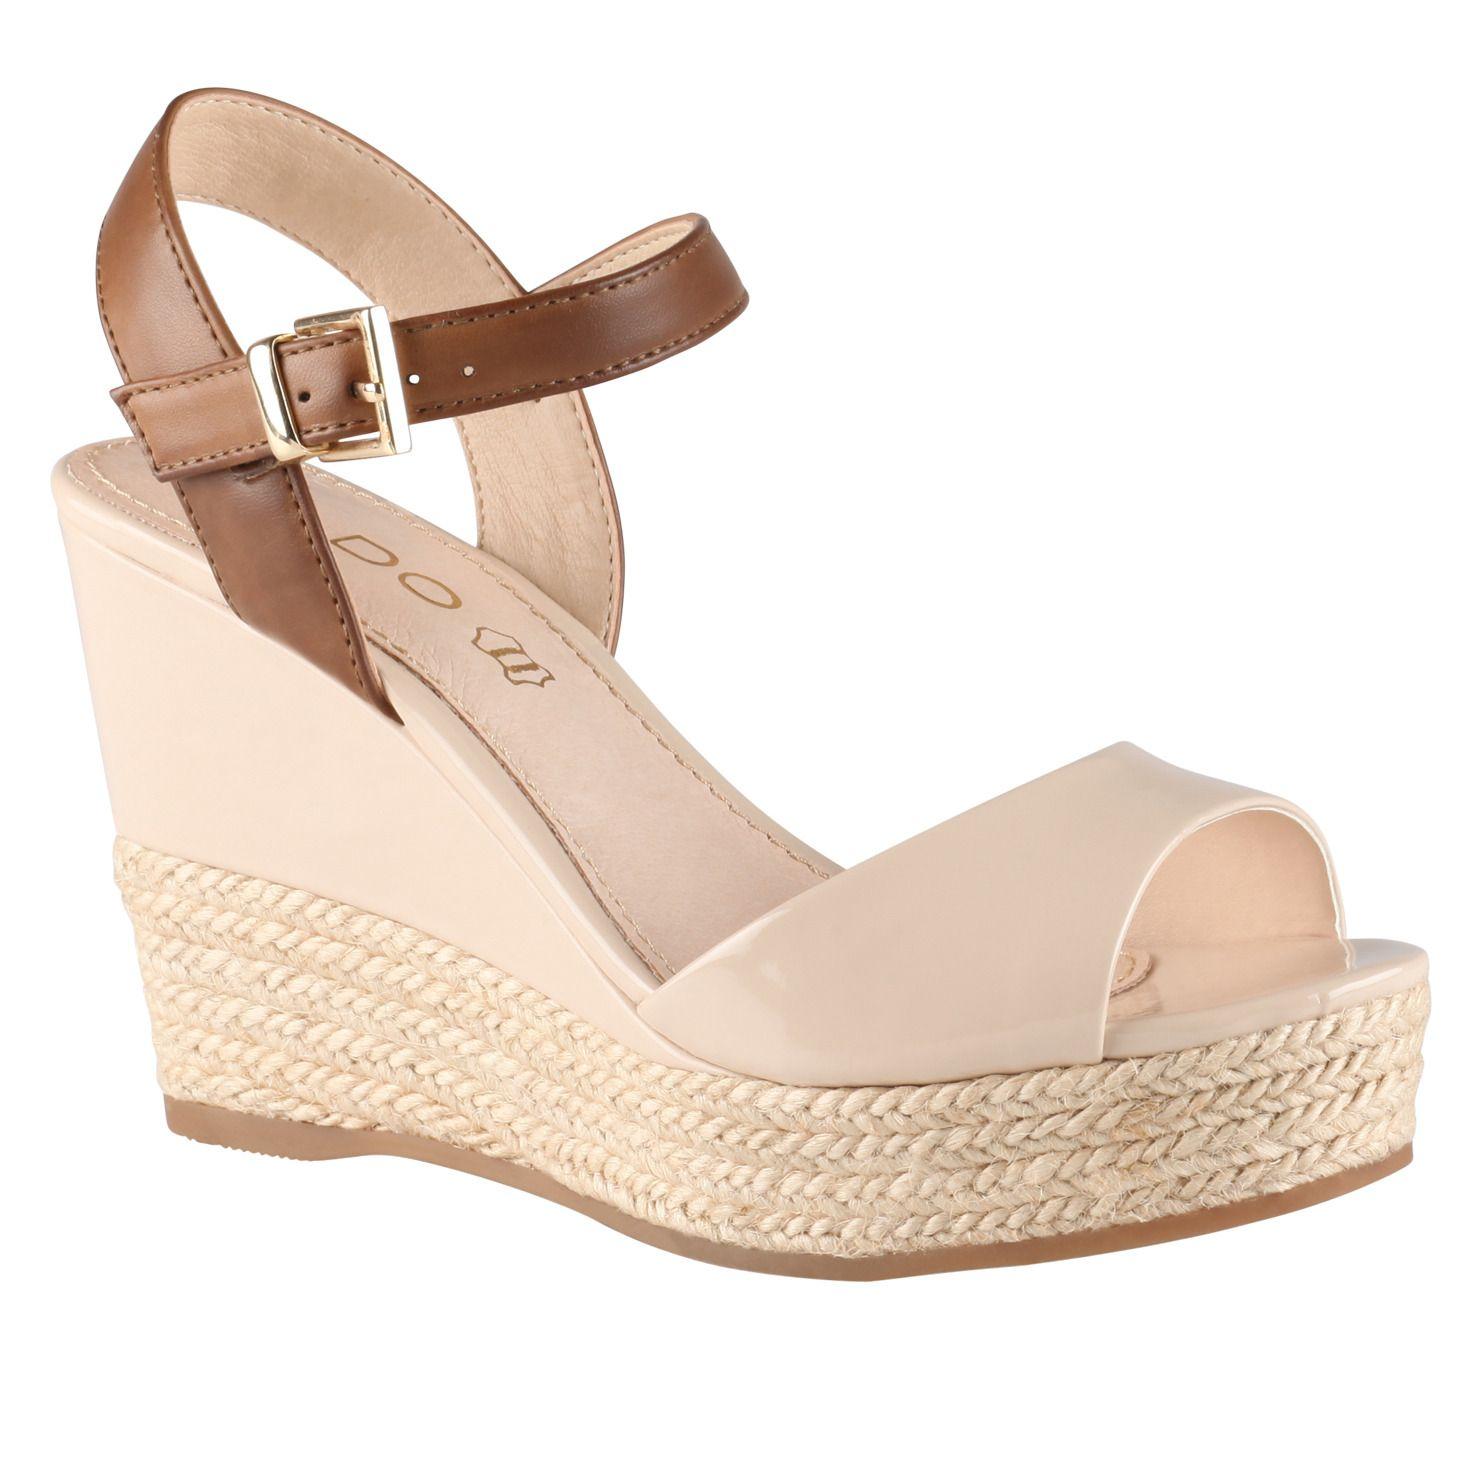 bb7e2527bfc1 SCLAFANI - women s wedges sandals for sale at ALDO Shoes.